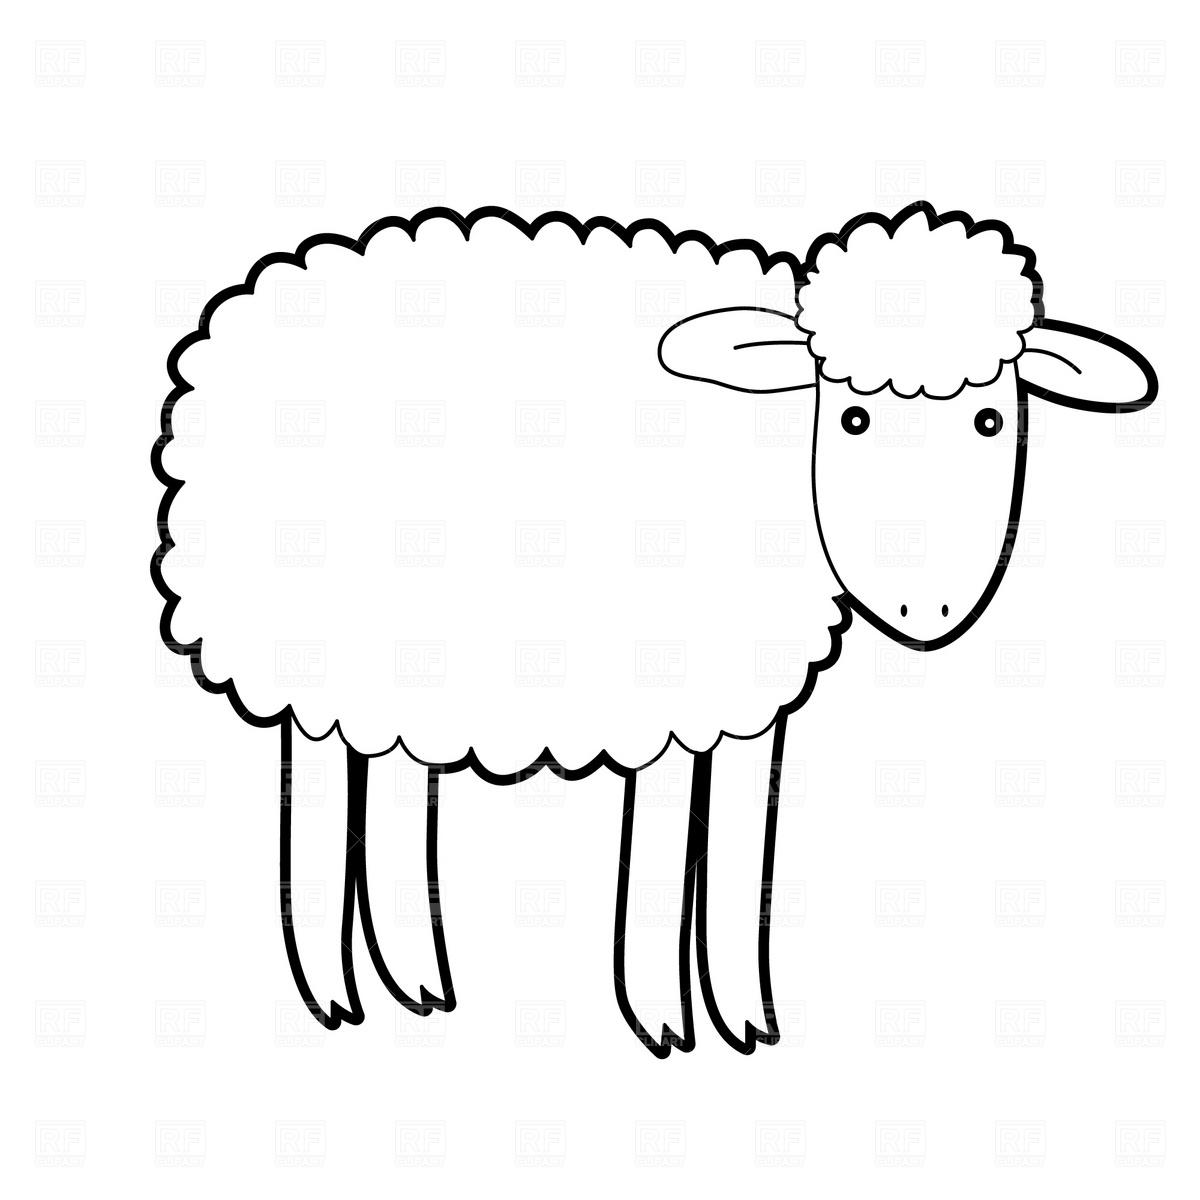 Cartoon Sheep Download Royalty Free Vector Clipart Eps